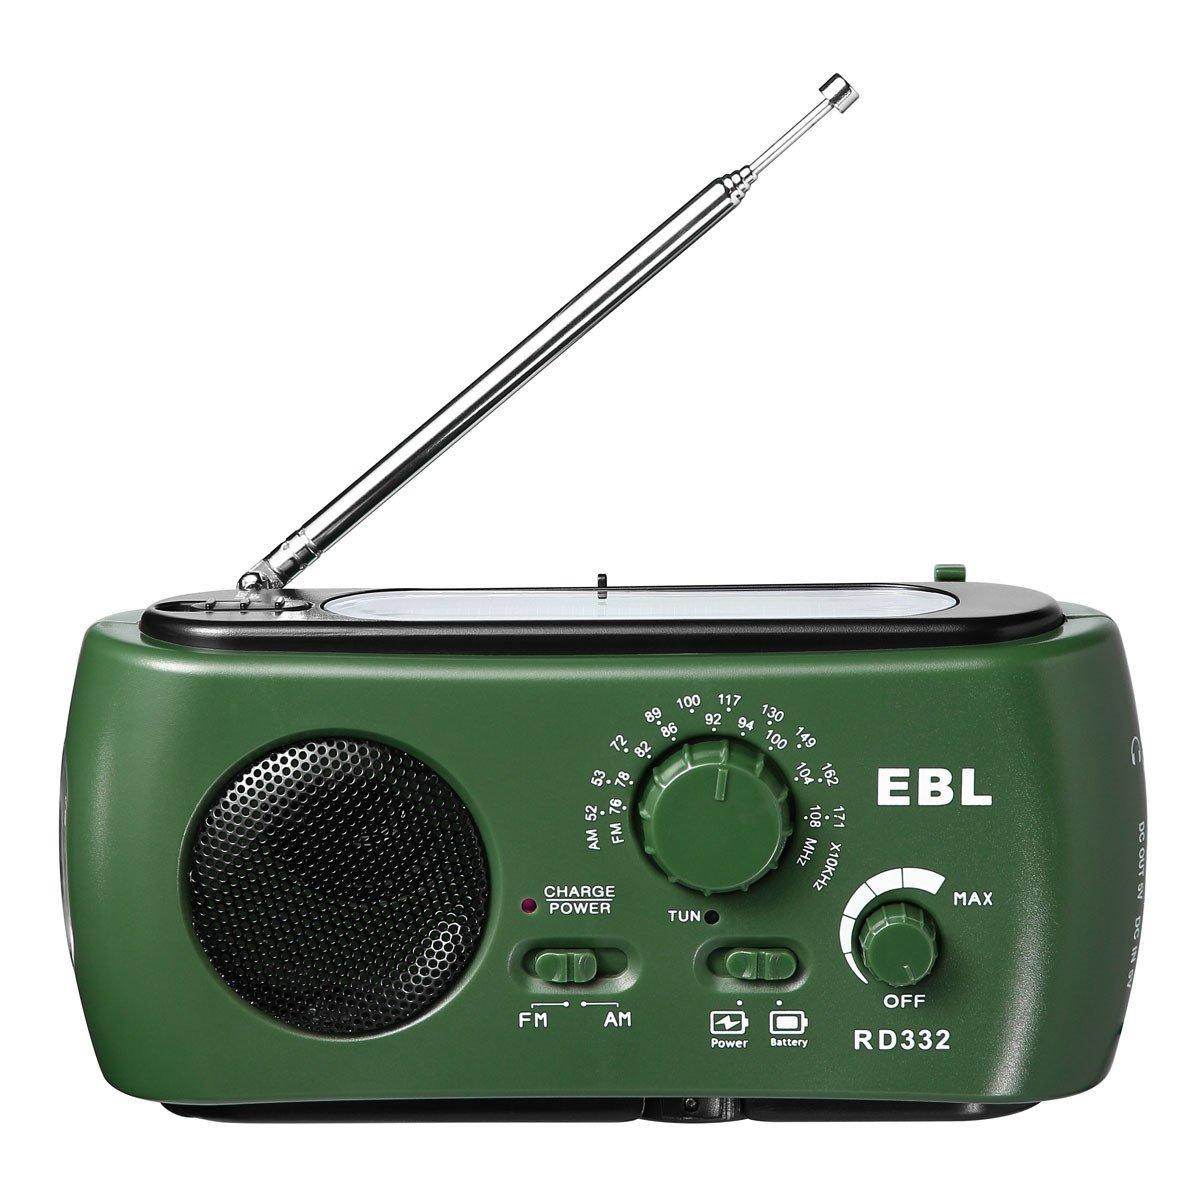 EBL Portable Emergency Solar Crank AM FM Camp Radio with LED Flashlight, USB Output Port, Reading Lamp